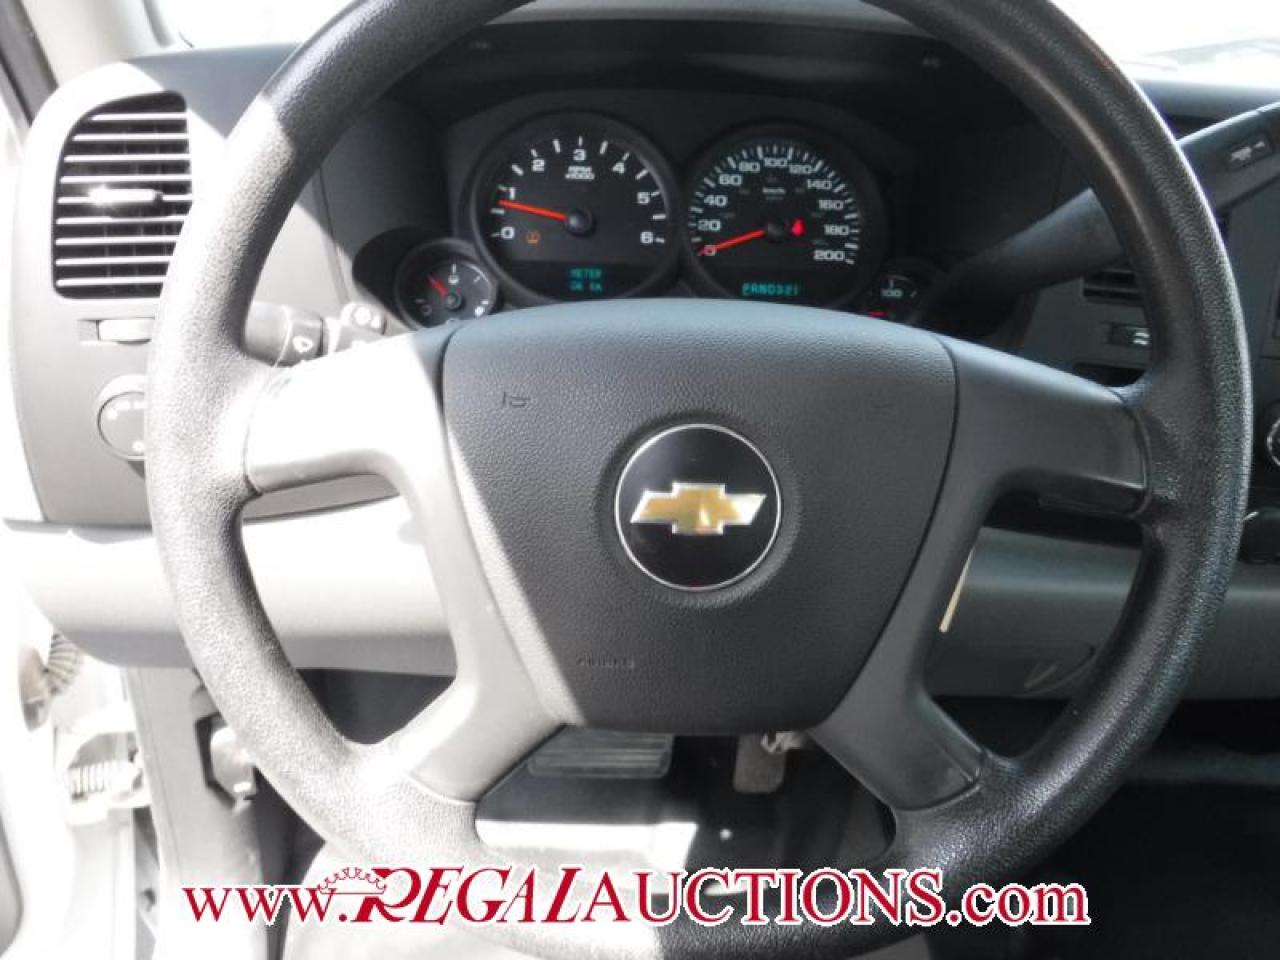 2011 Chevrolet SILVERADO 1500  EXT CAB SWB 4WD